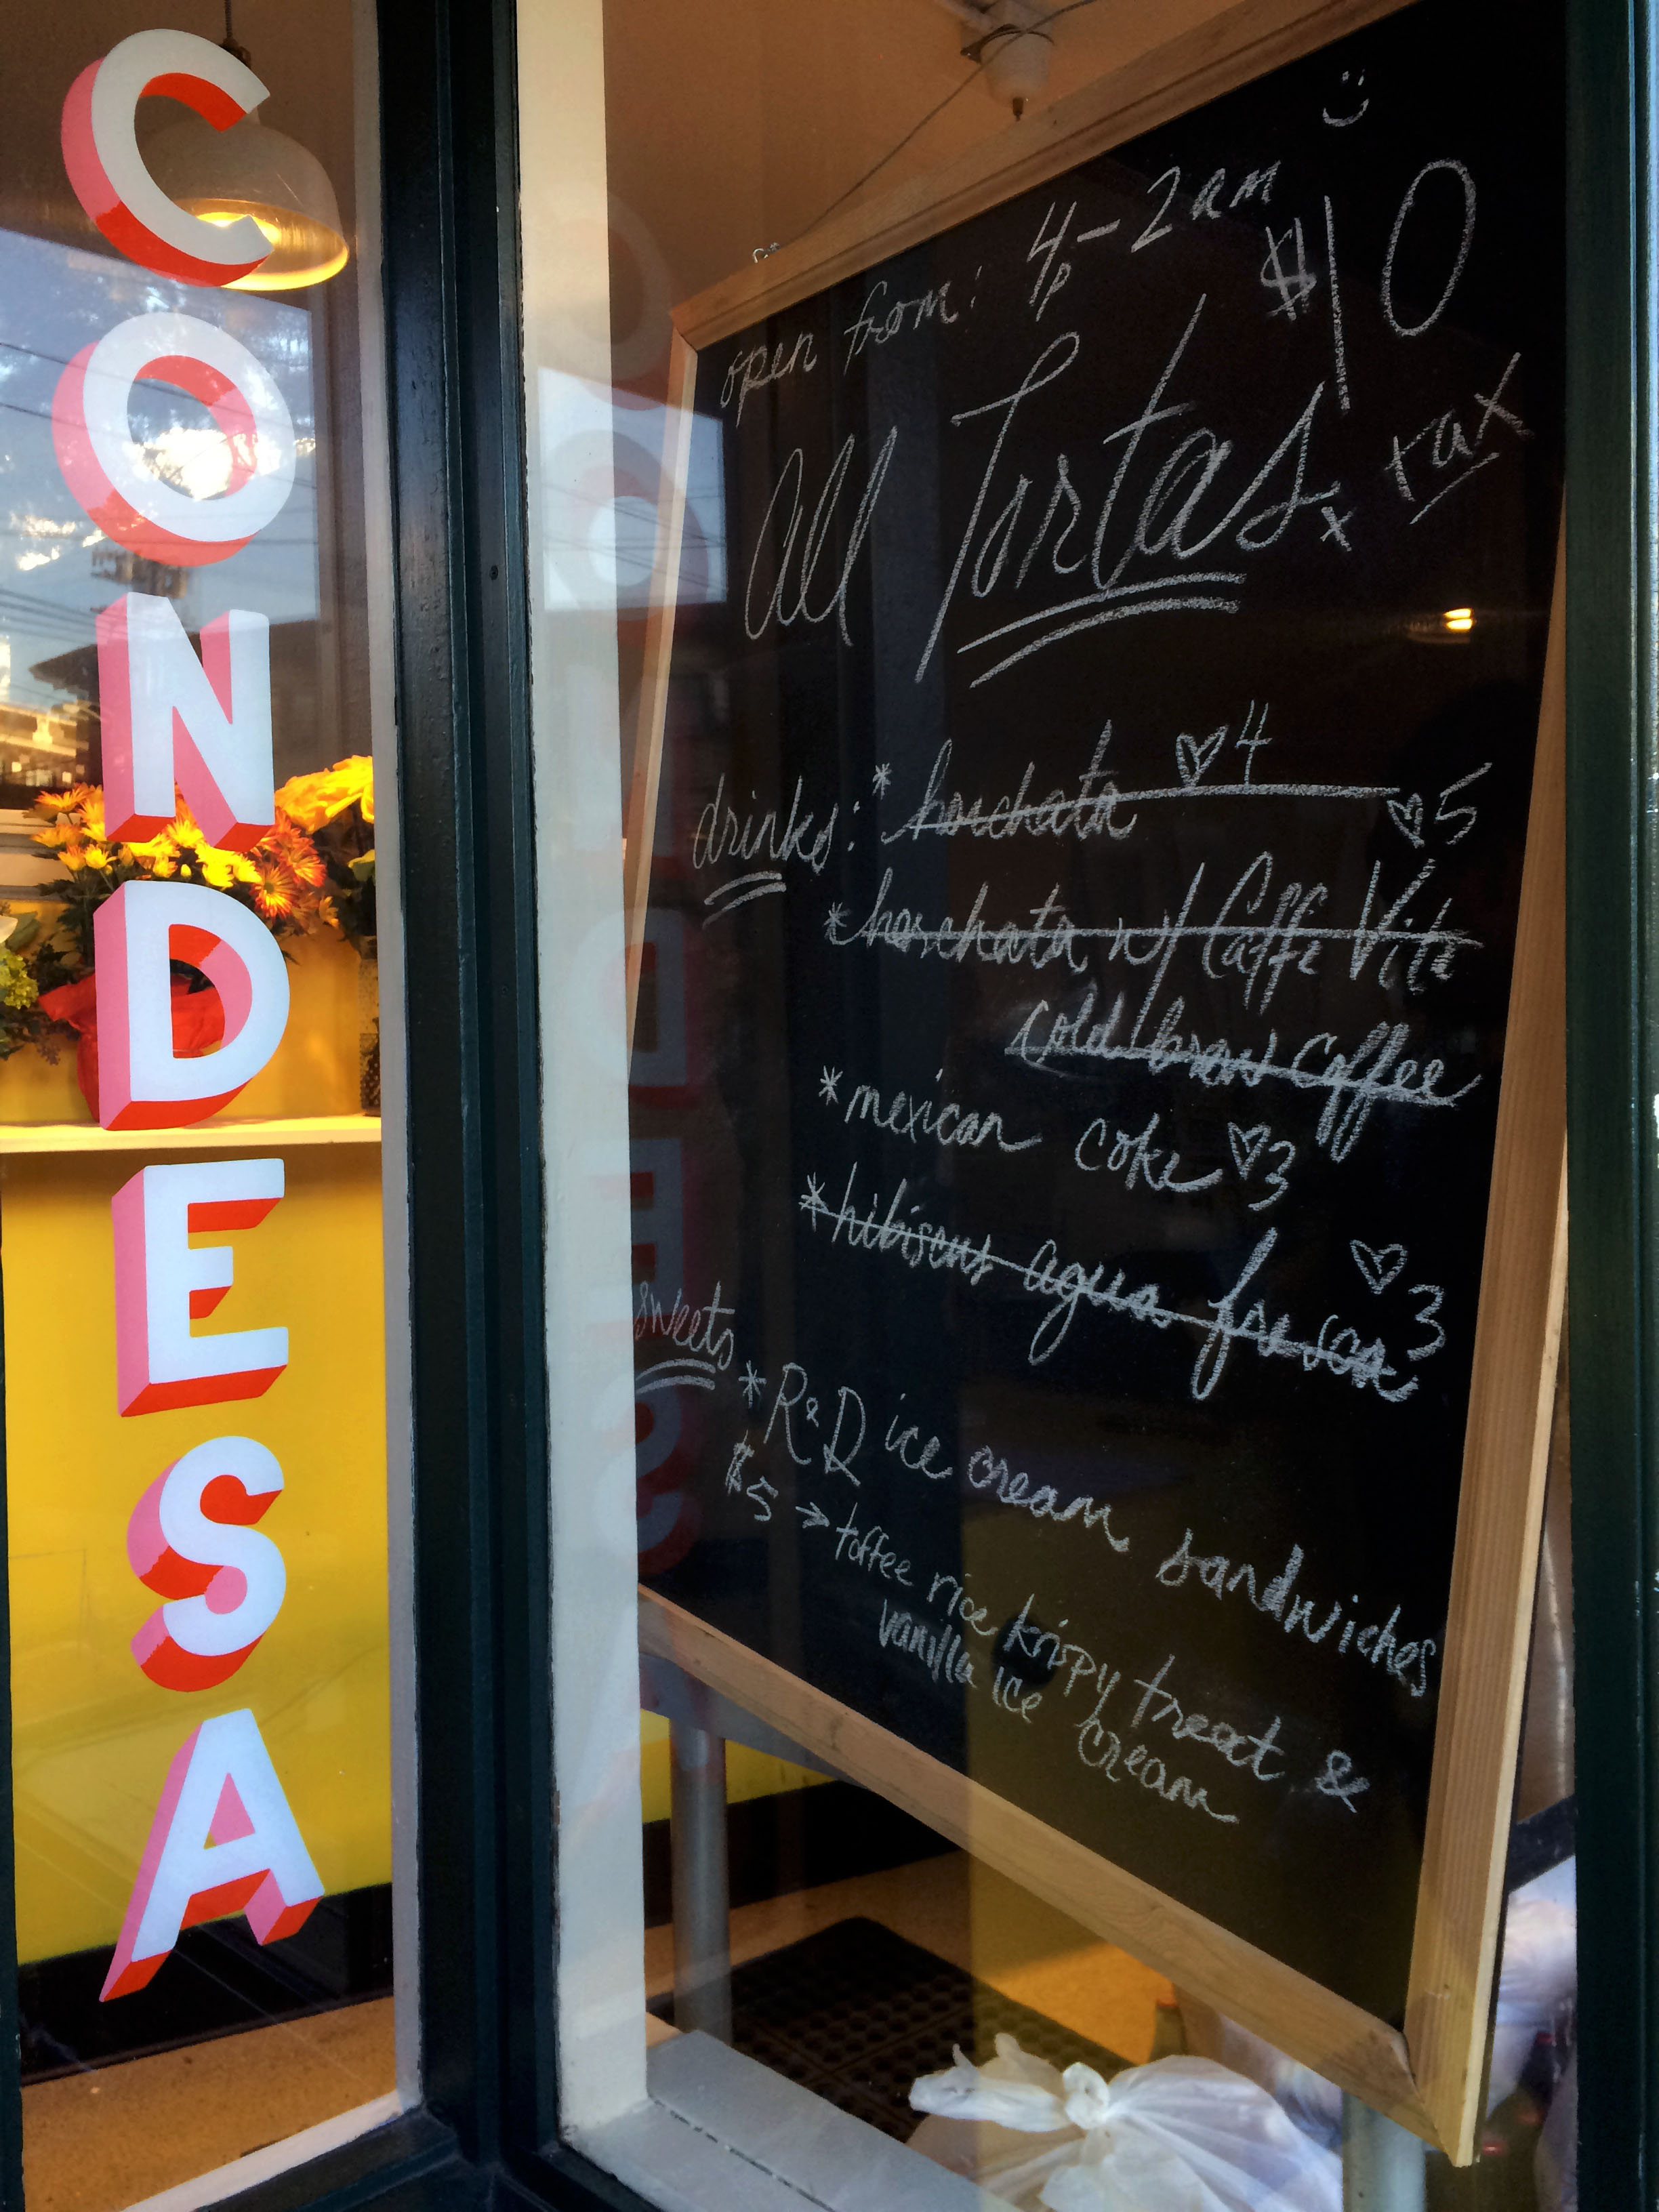 Tortas Condesa dessert and drink menu